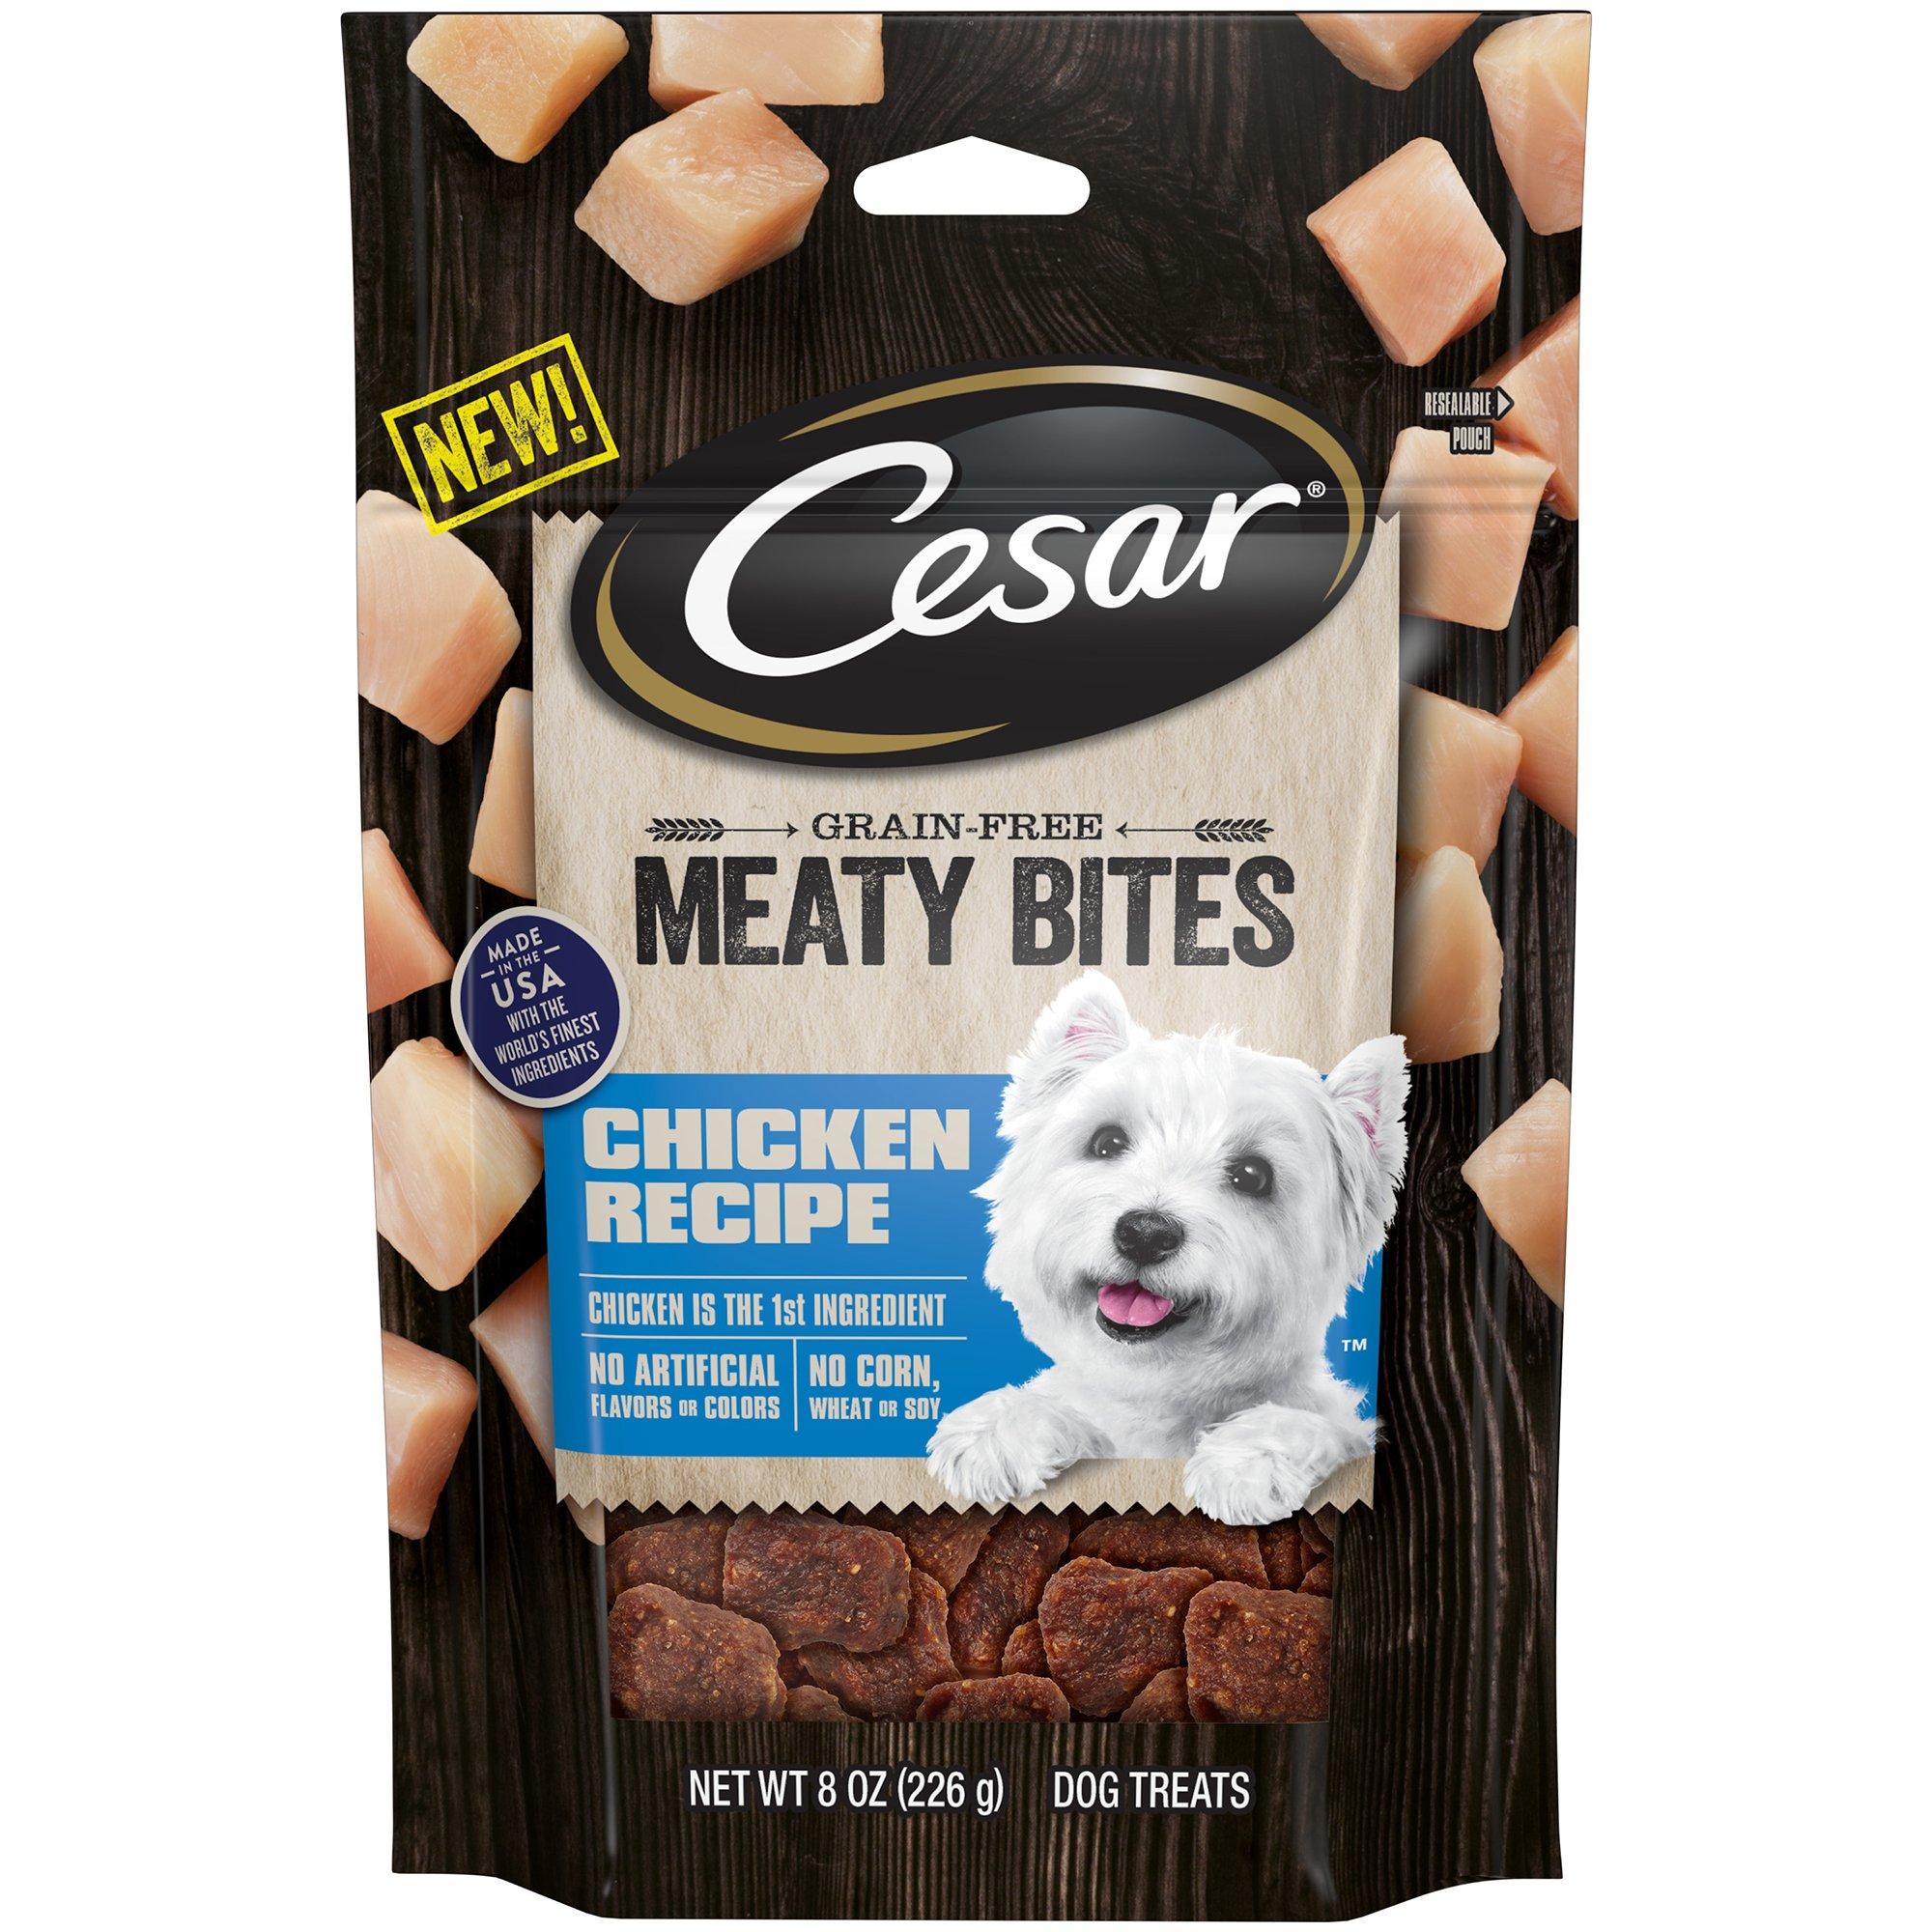 Cesar Meaty Bites Grain Free Dog Treats Chicken Recipe, (6) 8 Oz. Pouches by Cesar